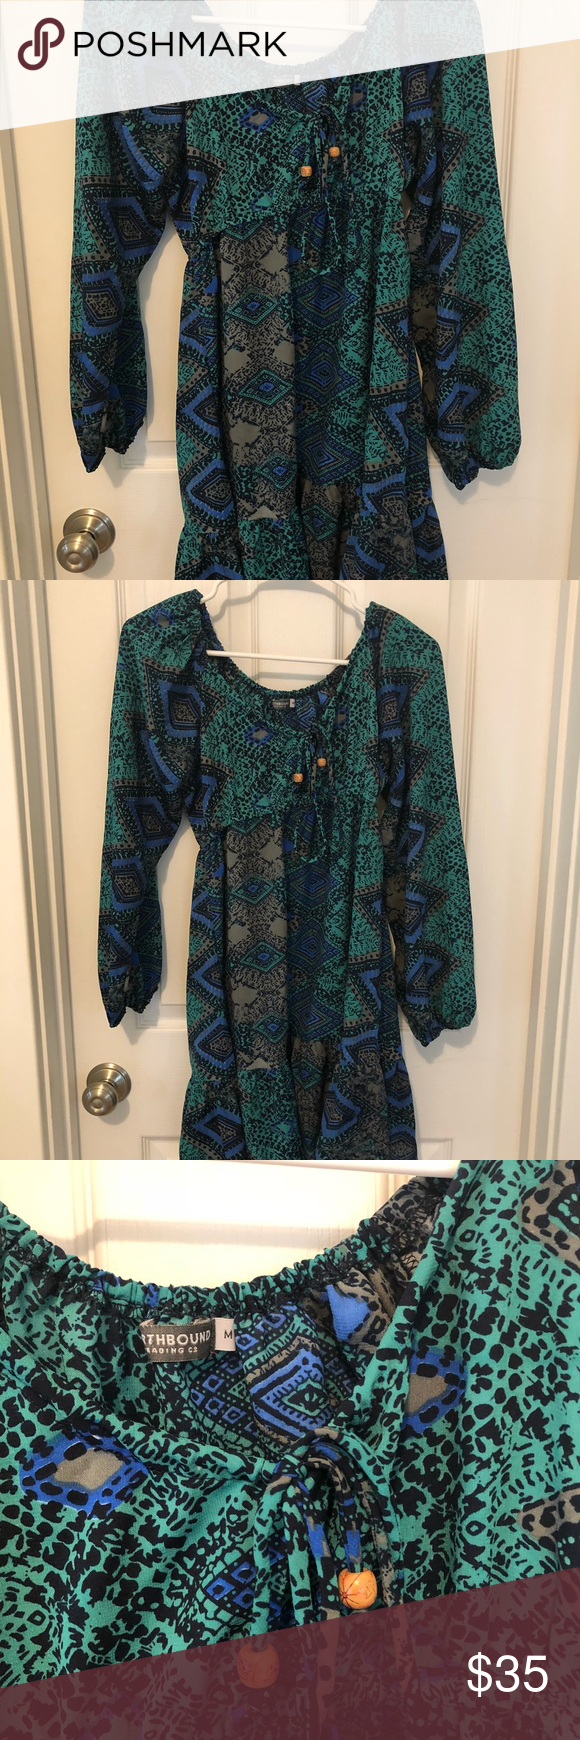 Earthbound trading co dress size medium in my posh closet